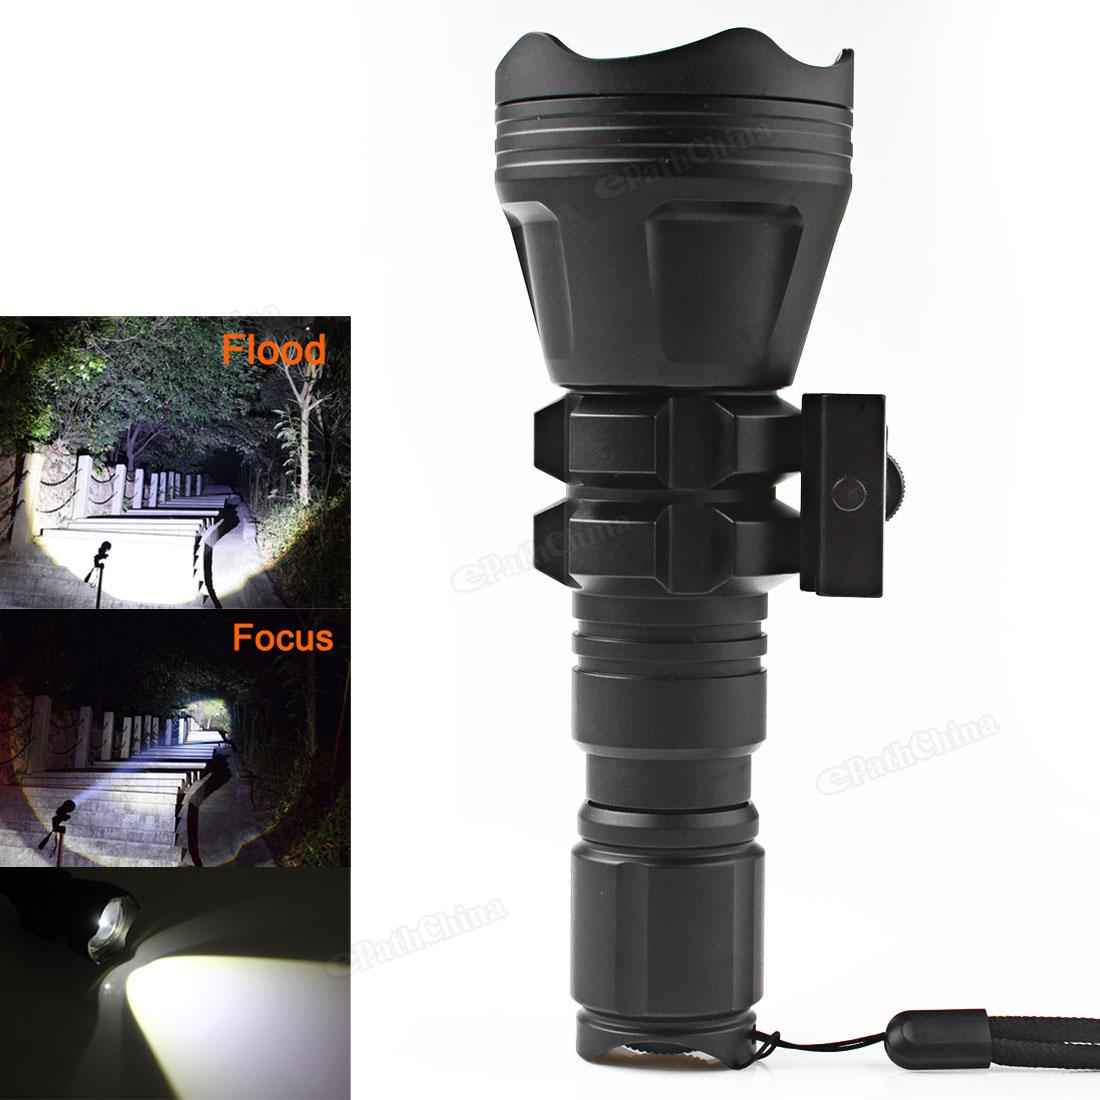 B158 LED Flashlight Convex Lens Zoom Torch Lamp XM L2 U4 Hunting Light 900 Lumens Aluminum Tactical Flash Lamp